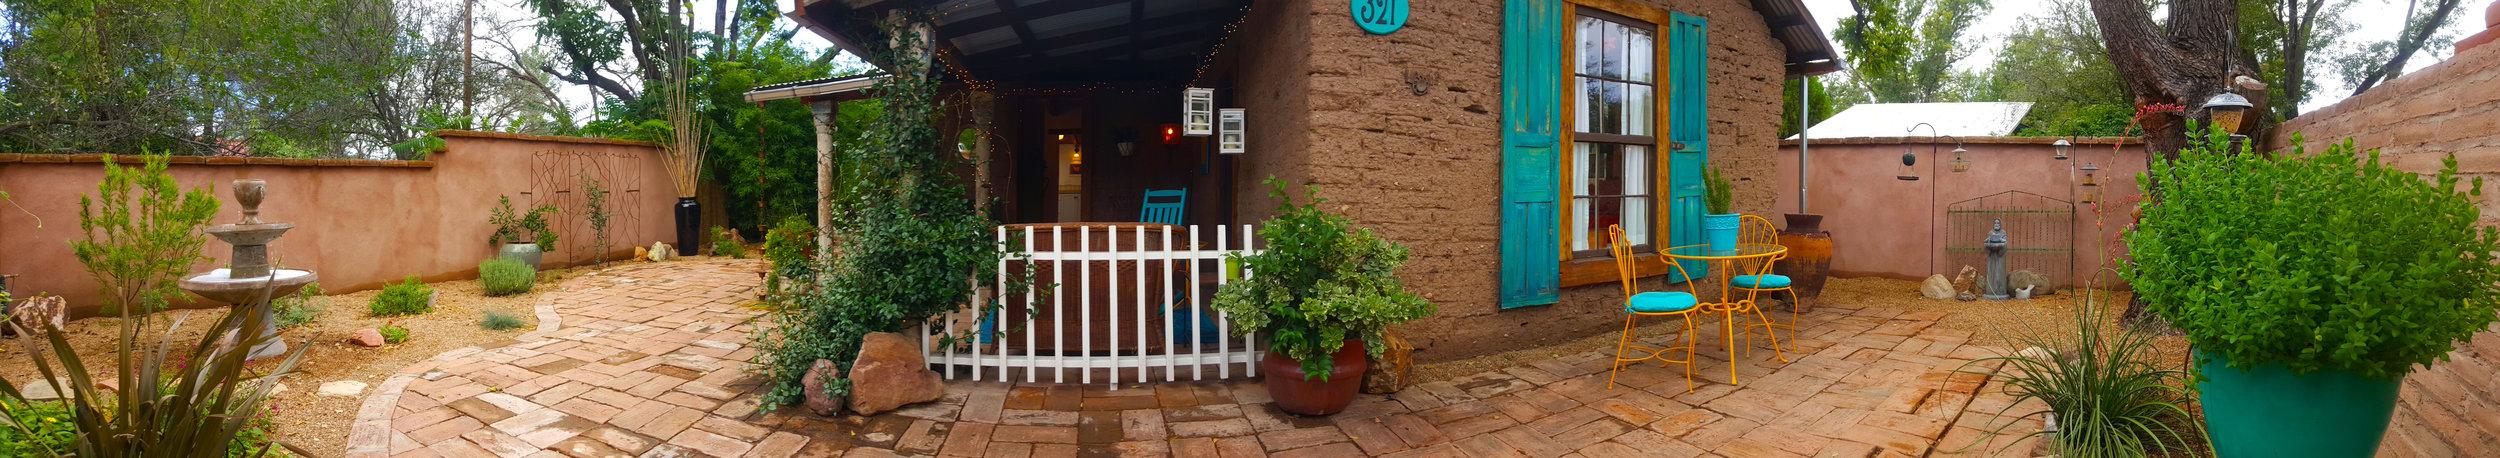 Casa_Front_Courtyard_Panorama.jpg